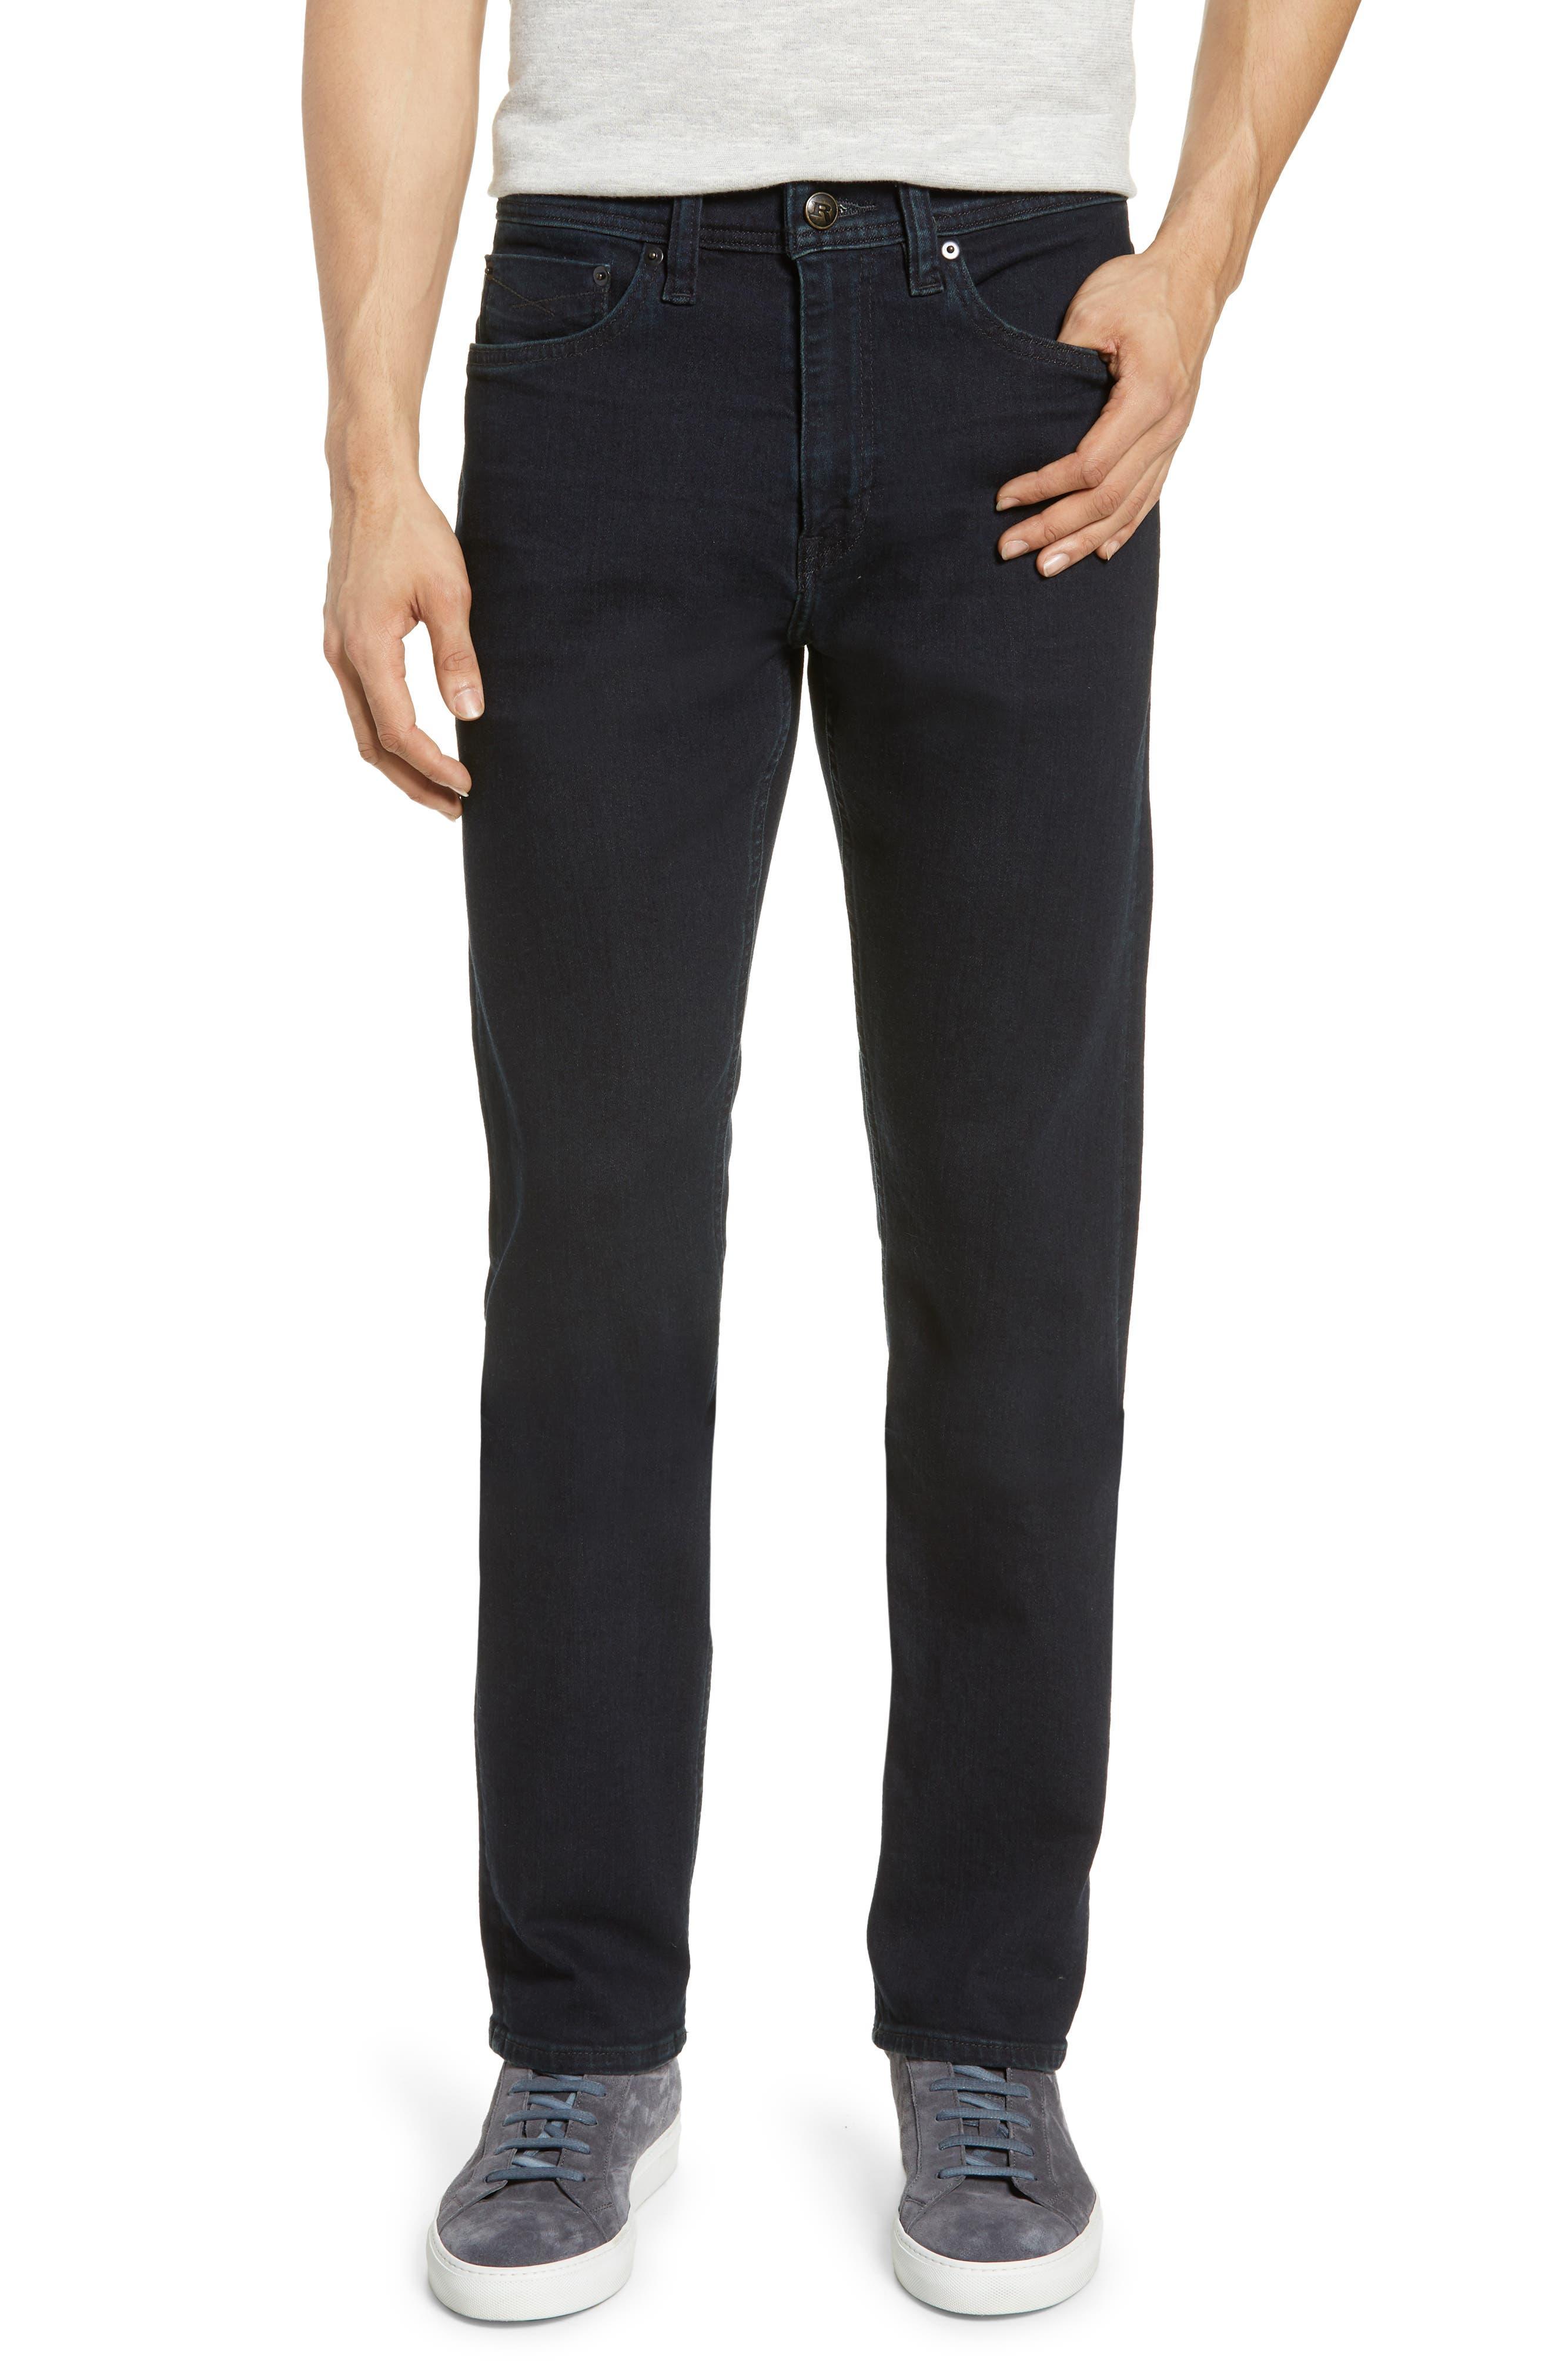 REVTOWN, Sharp Slim Fit Jeans, Main thumbnail 1, color, RINSE INDIGO